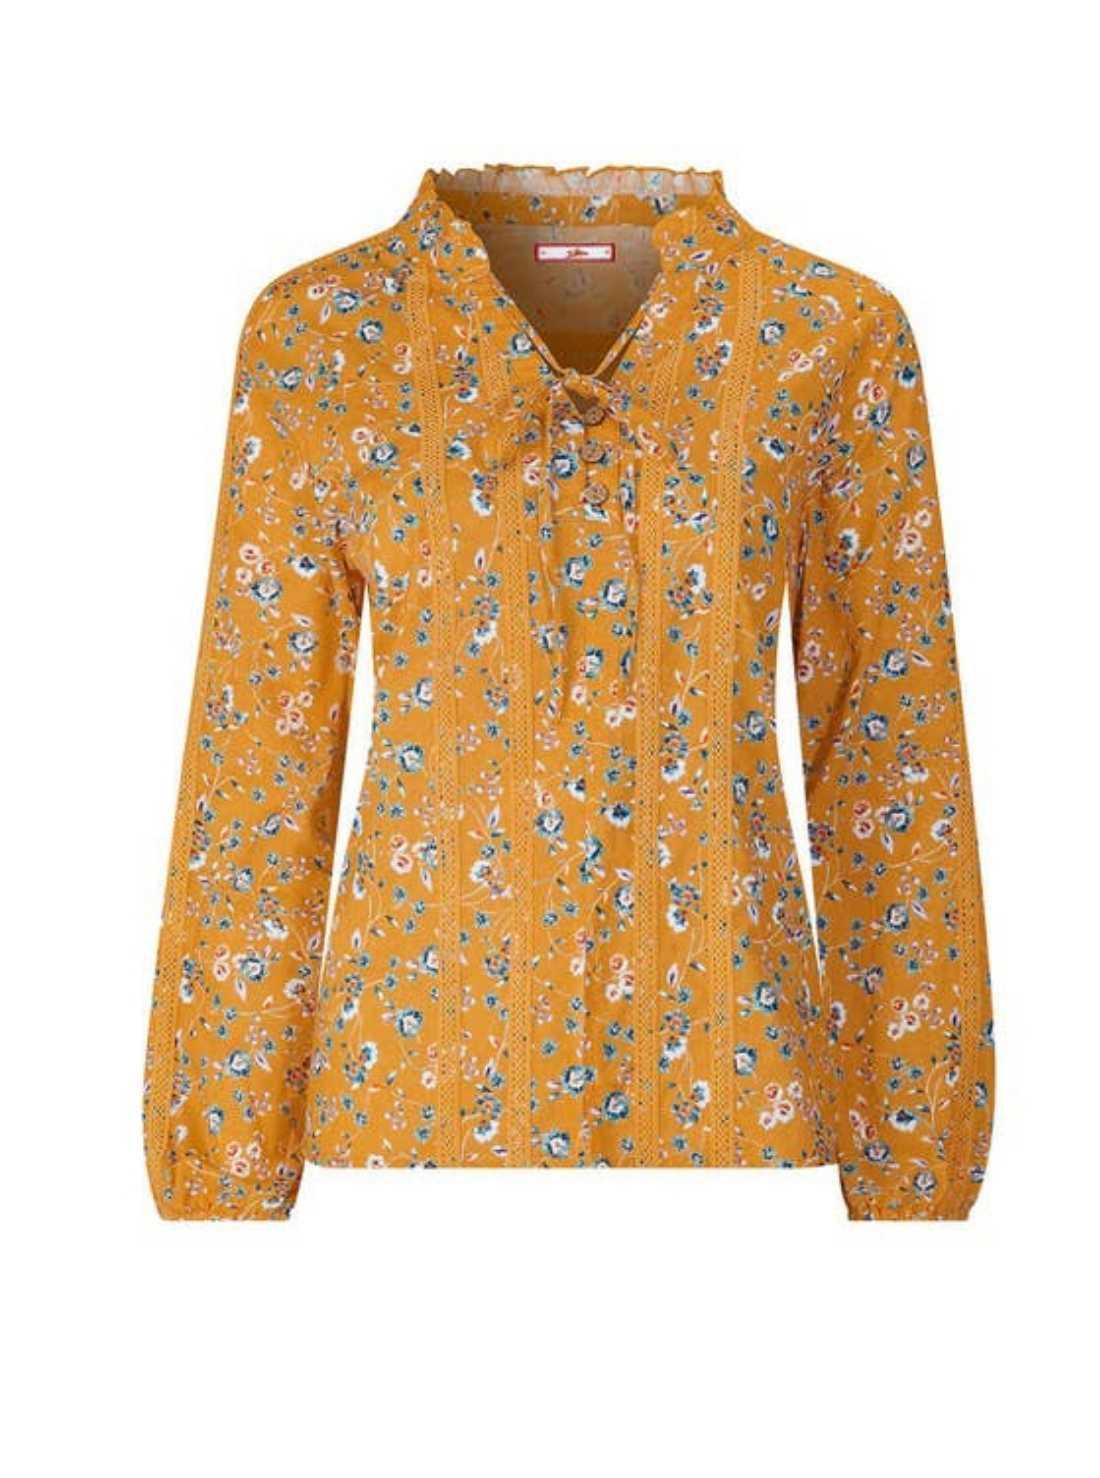 Fab floral boho blouse